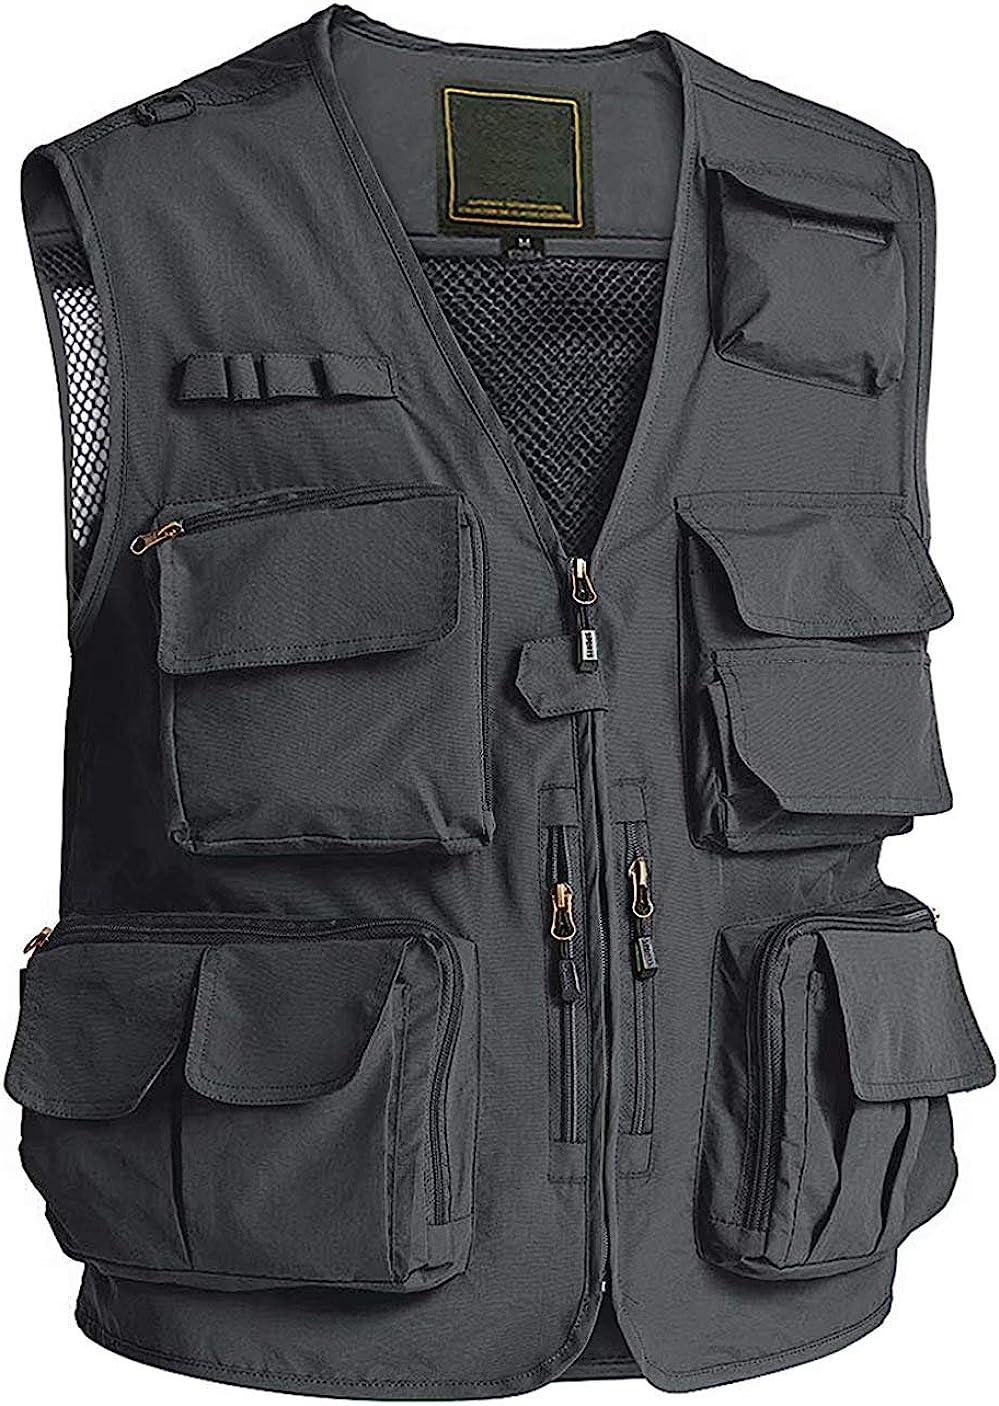 Cargo Vest Men Breathable Travel Vest Photo Journalist Vest with Multi Pockets Outerwear Vest for Men Athletic Vest Work Vest